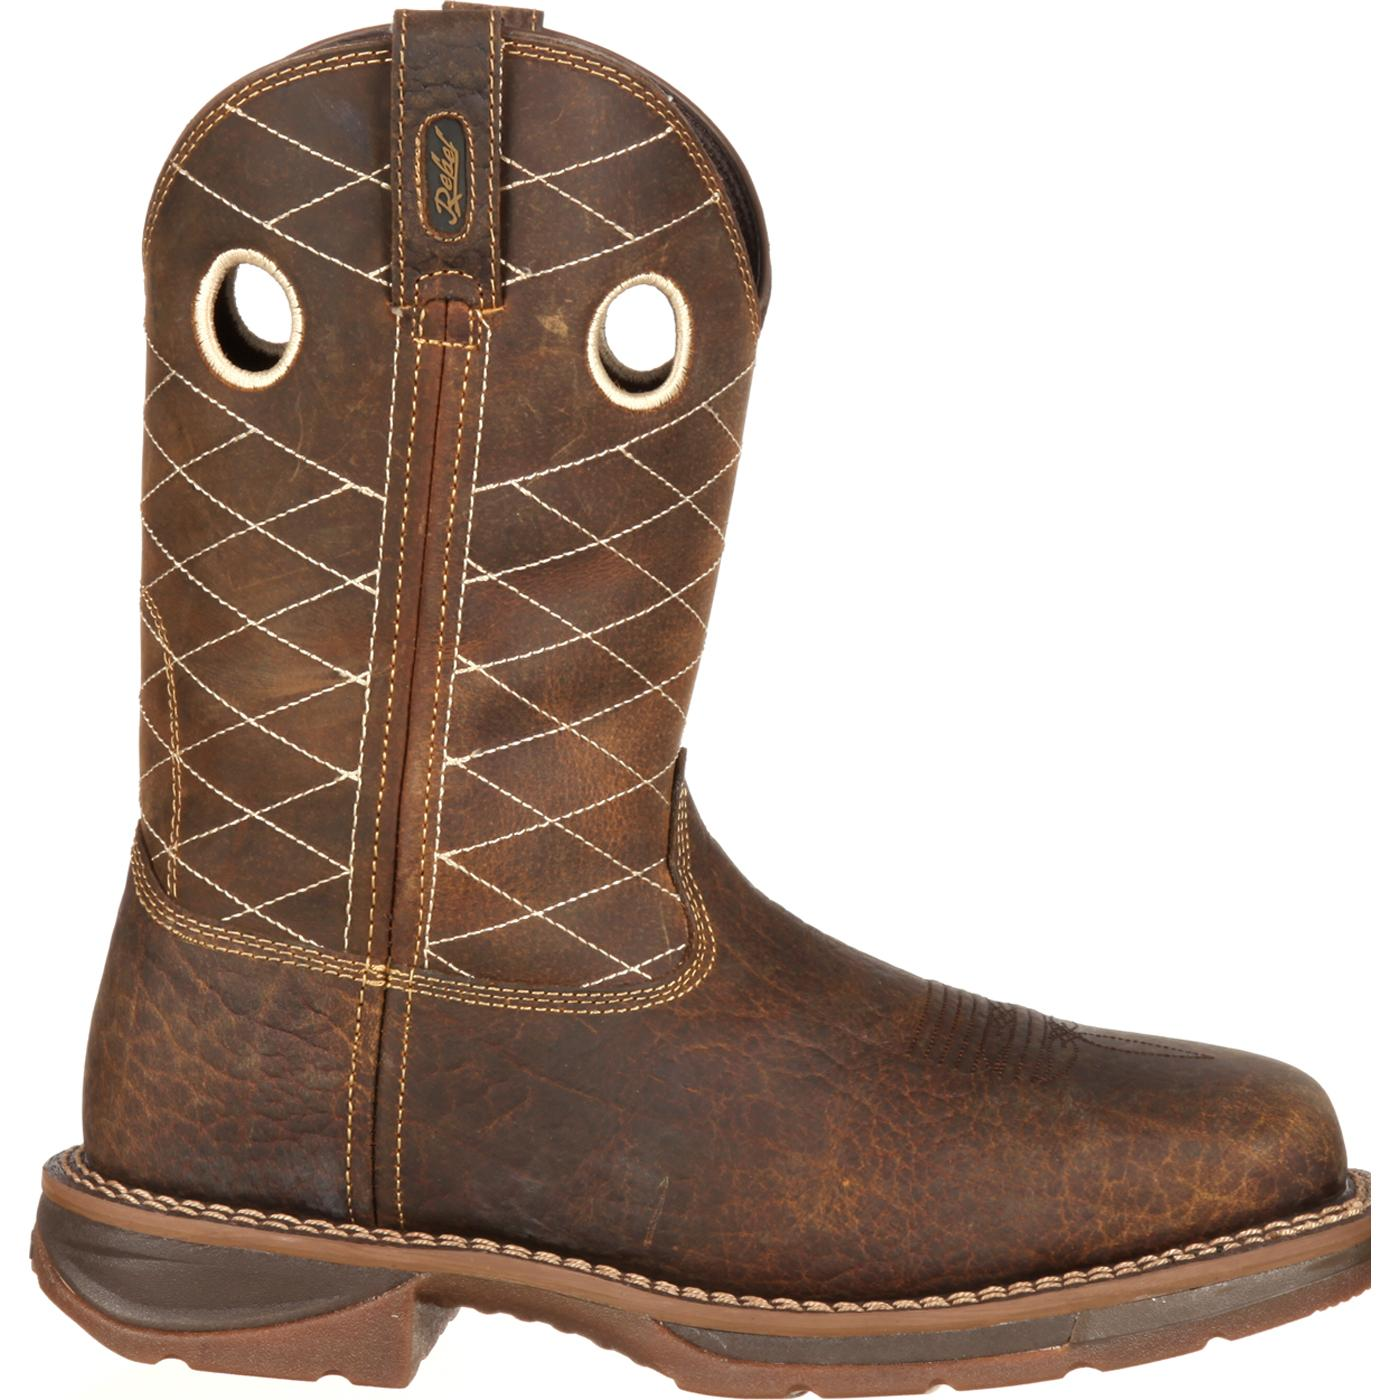 workin rebel by durango brown composite toe western work